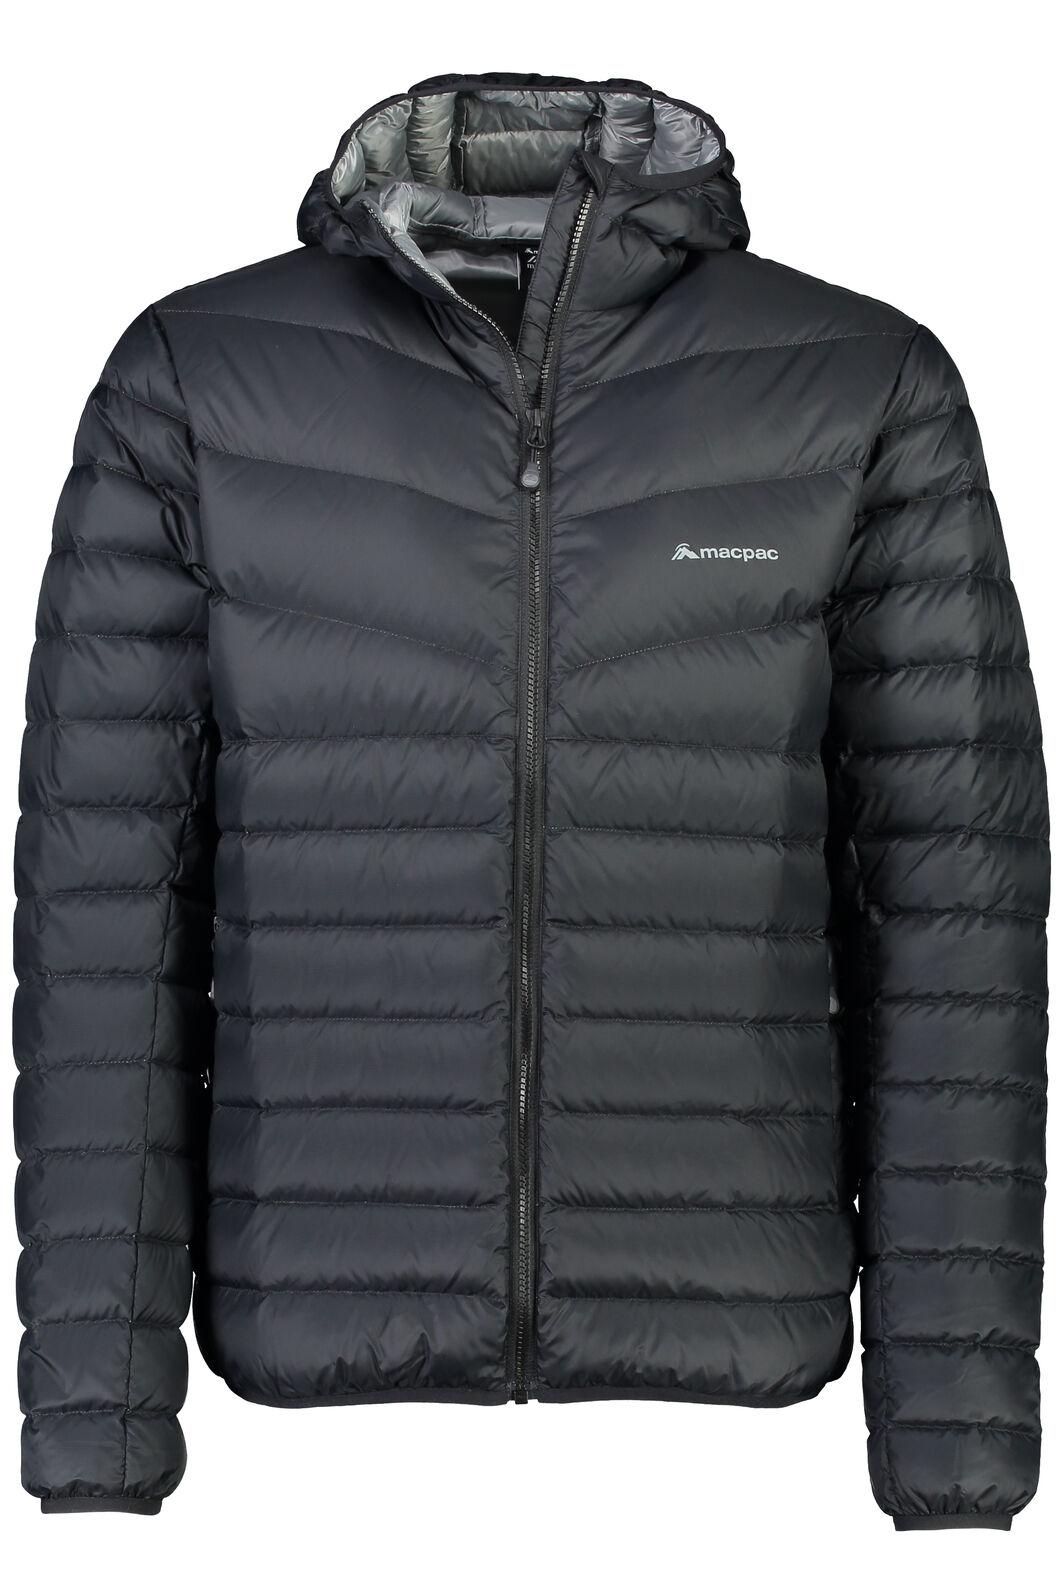 Macpac Mercury Down Jacket - Men's, Black, hi-res